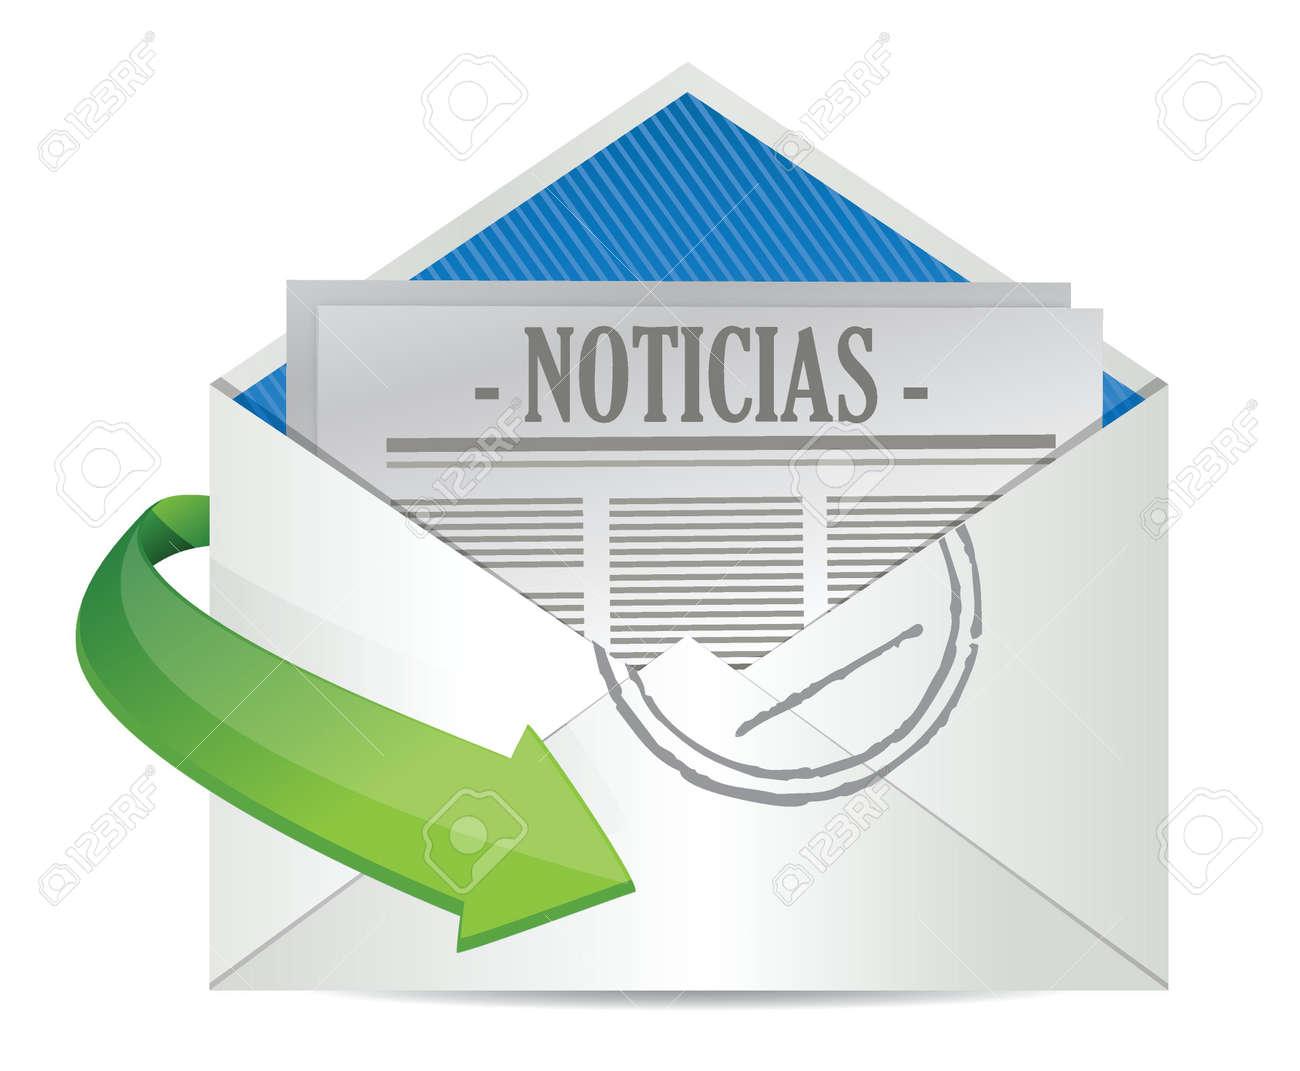 Open Envelope with News Paper inside in Spanish illustration design Stock Vector - 18158857